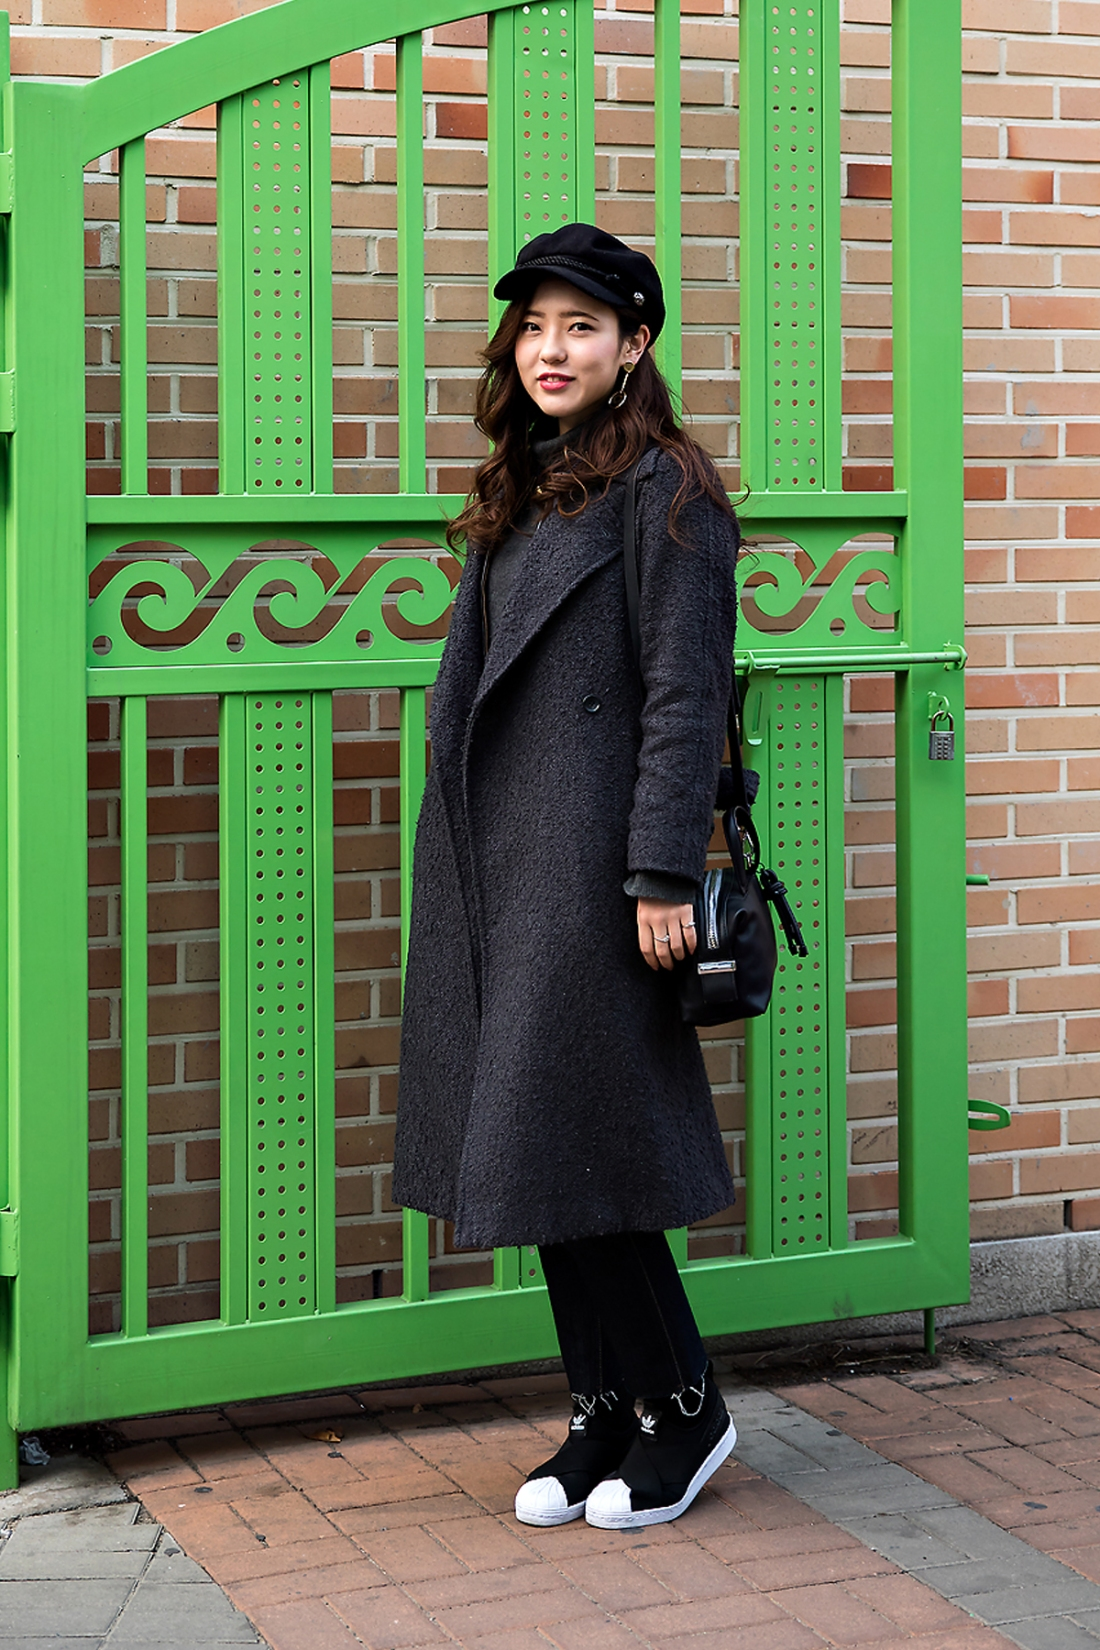 Moe, Street Fashion 2017 in SEOUL.jpg